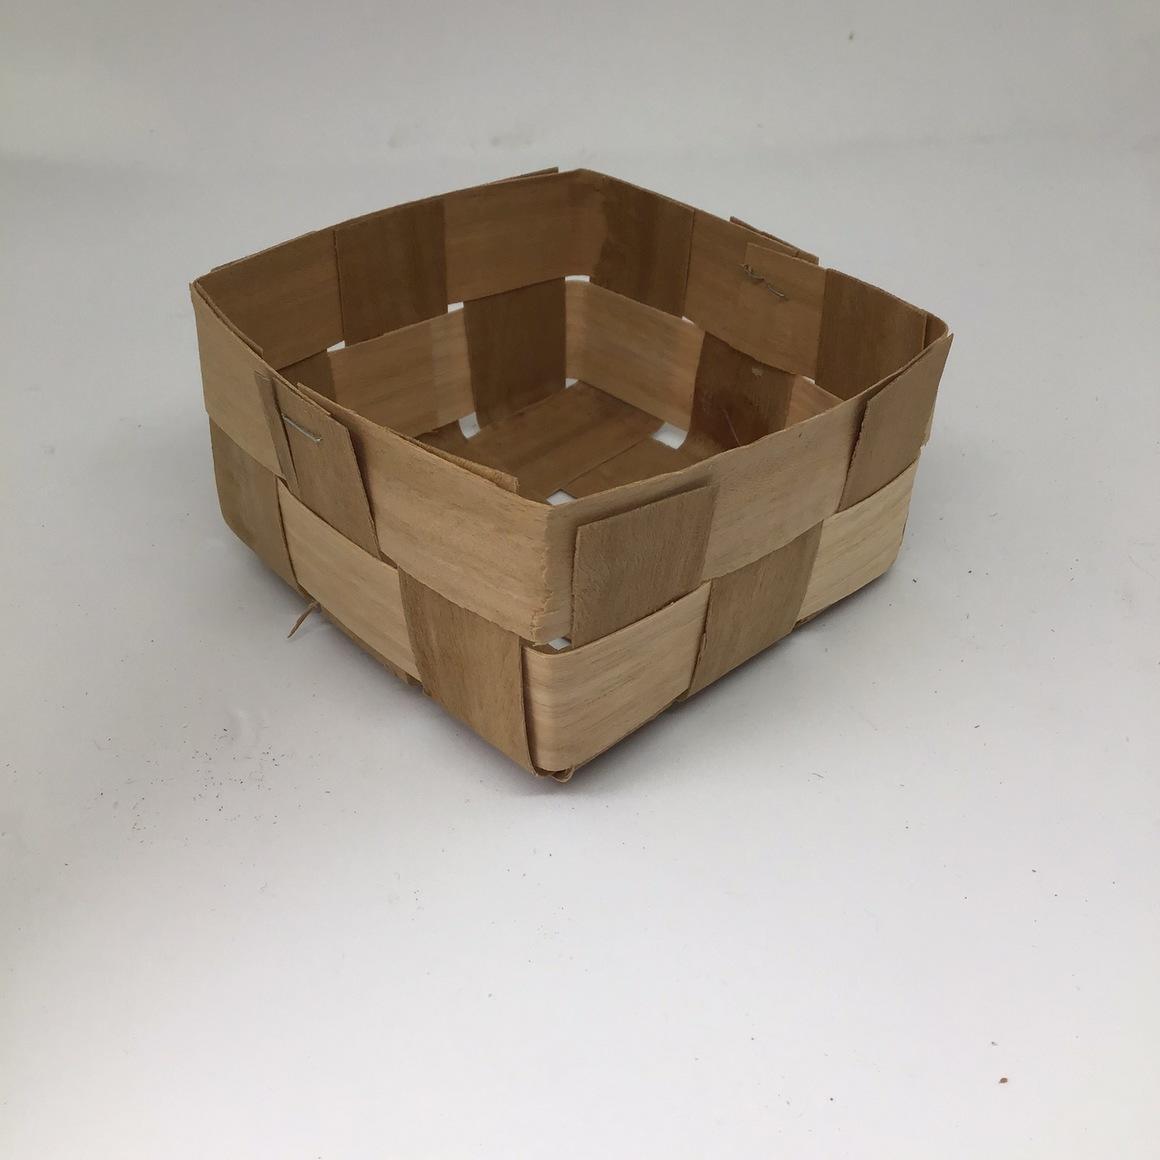 Small Hamper (10x10x5cm) Gift hamper, gift box | Trada Marketplace